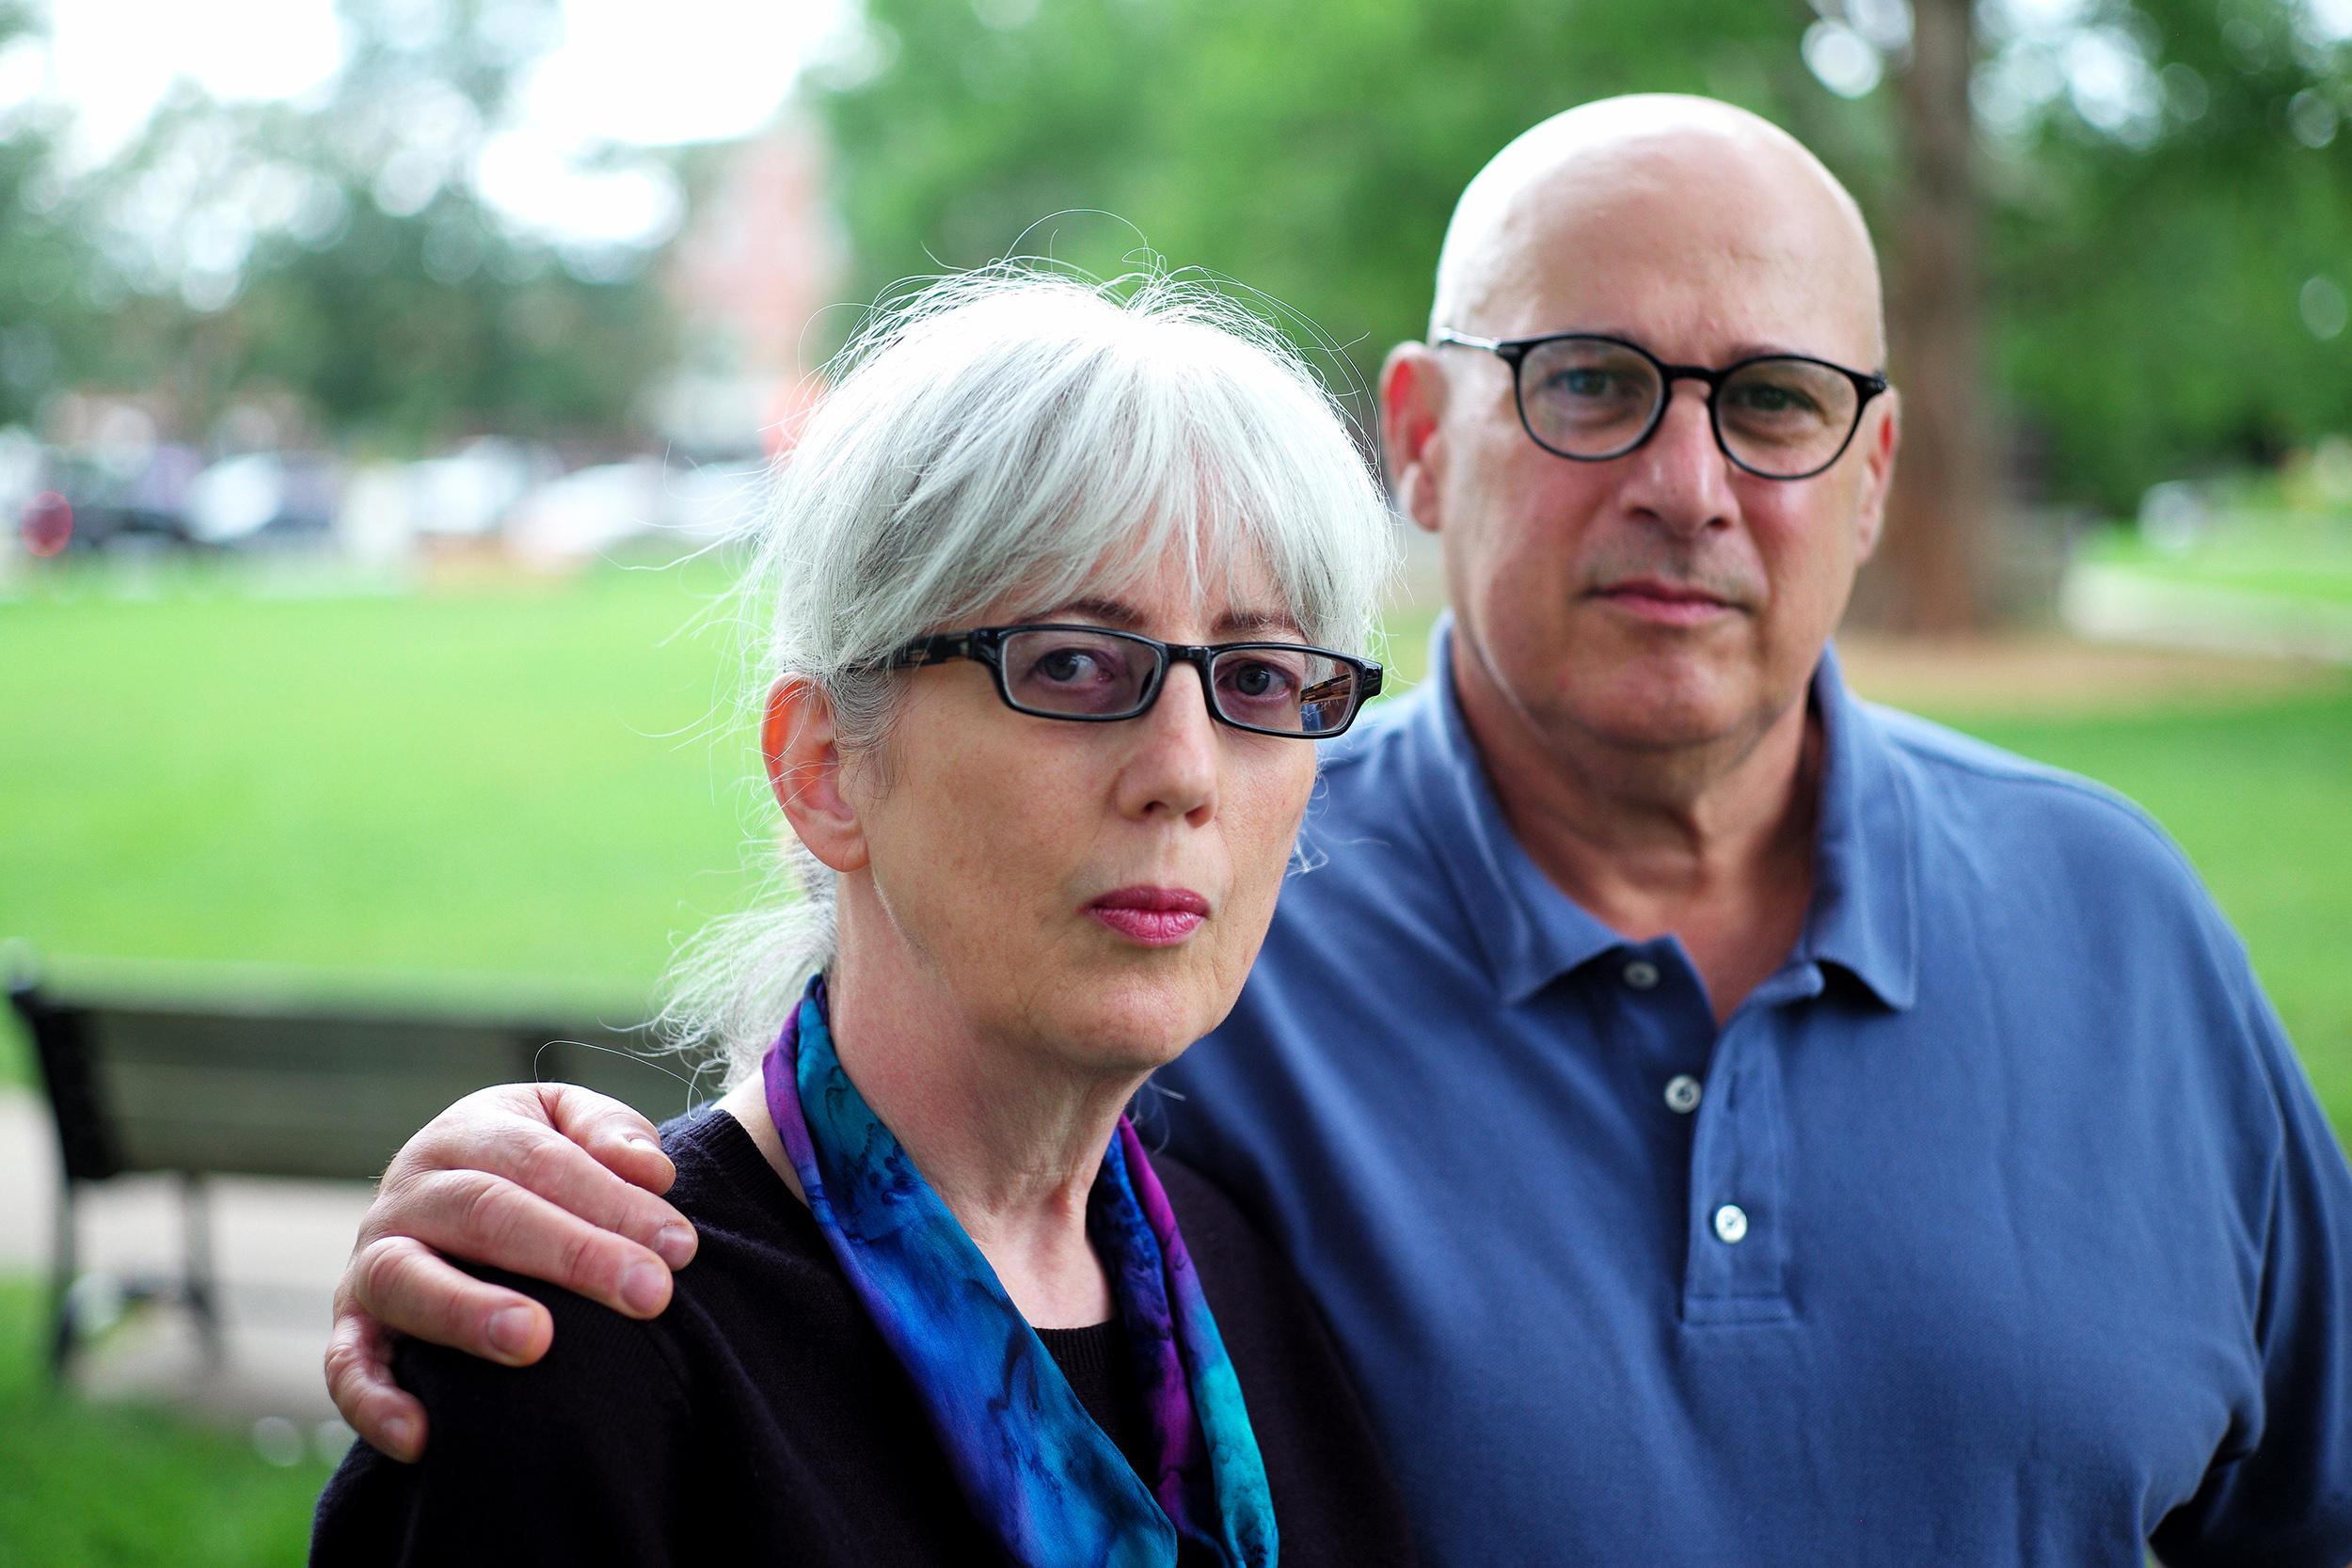 'It was an embalmed pig fetus': Targets of alleged eBay harassment speak out